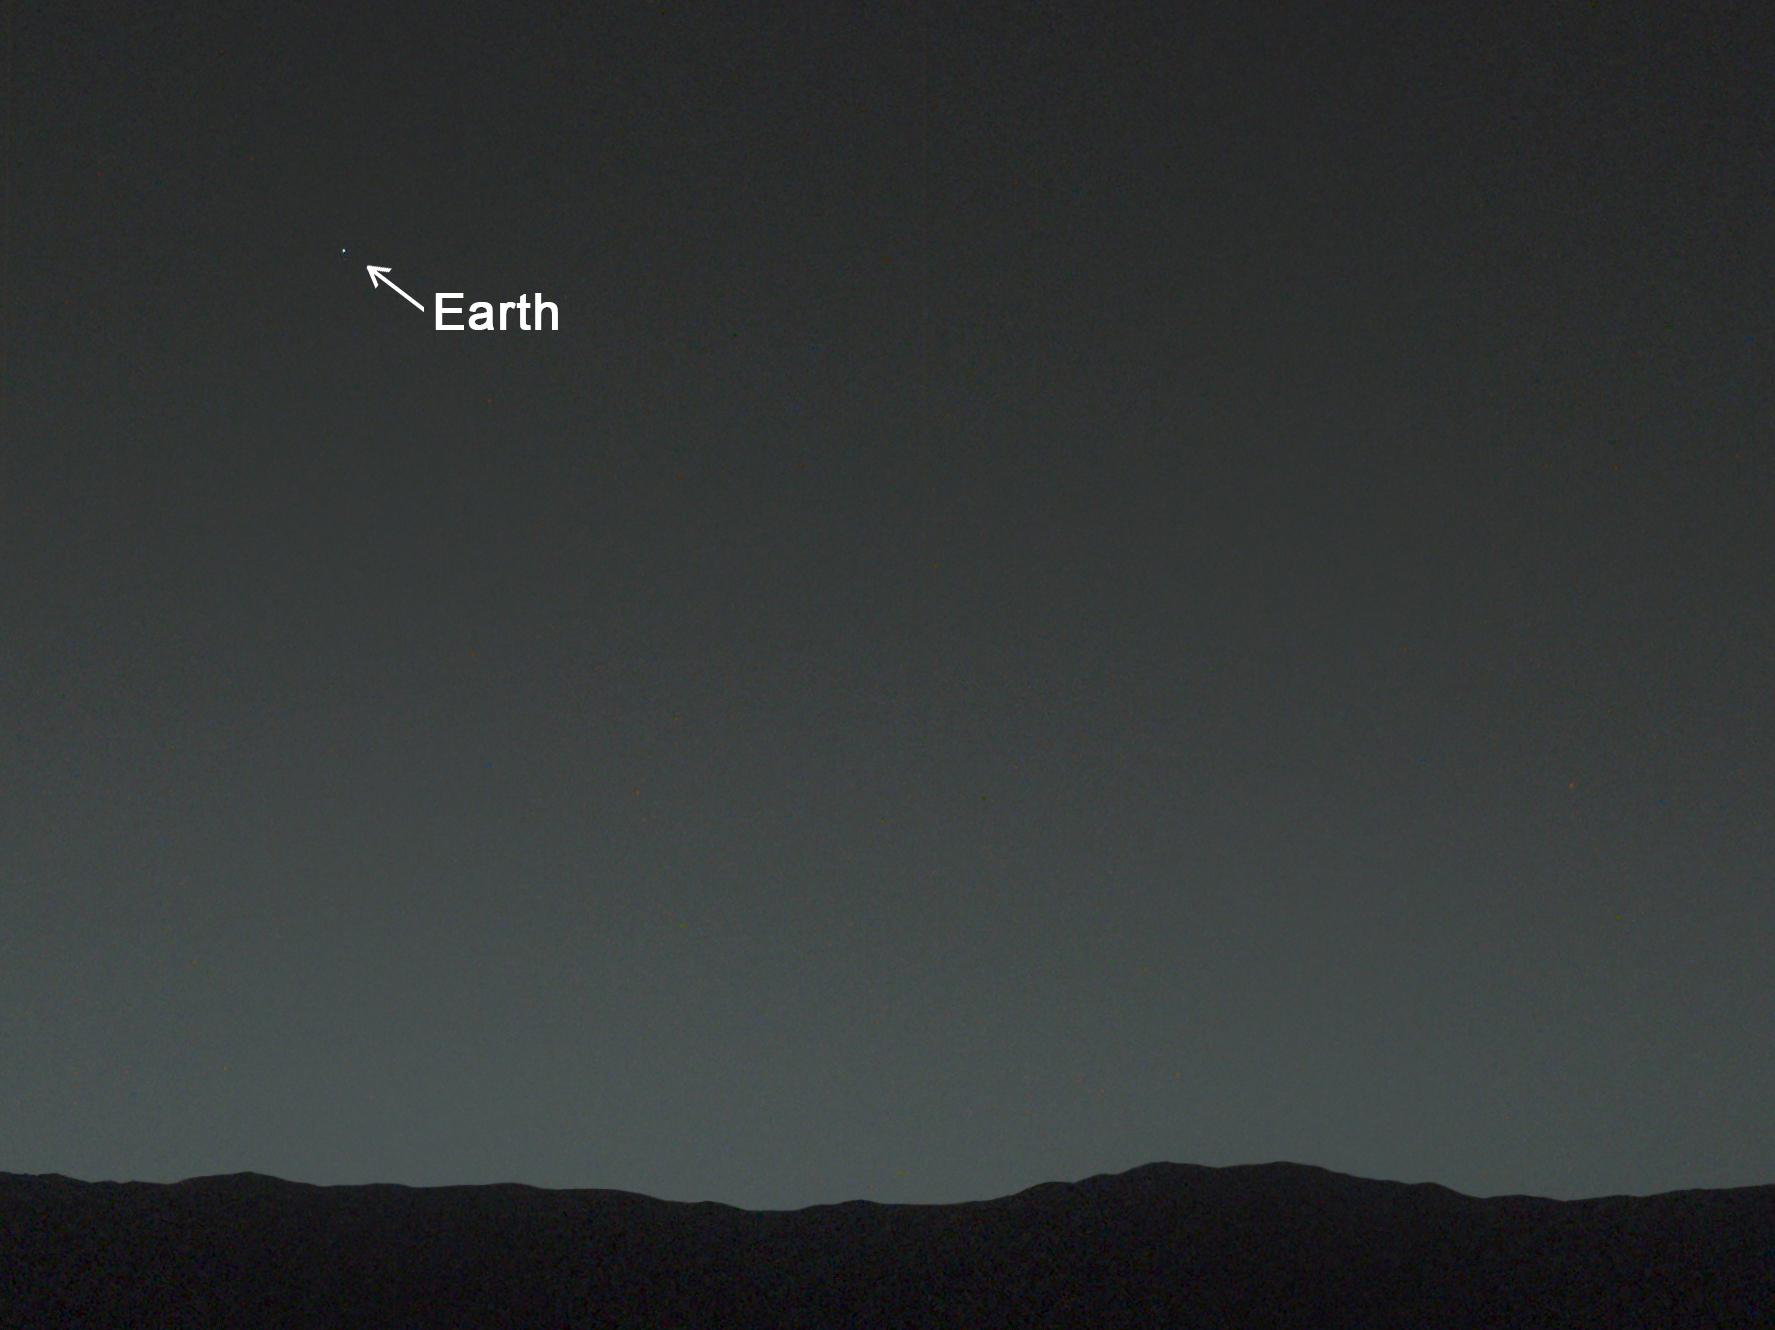 far earth from mars - photo #5